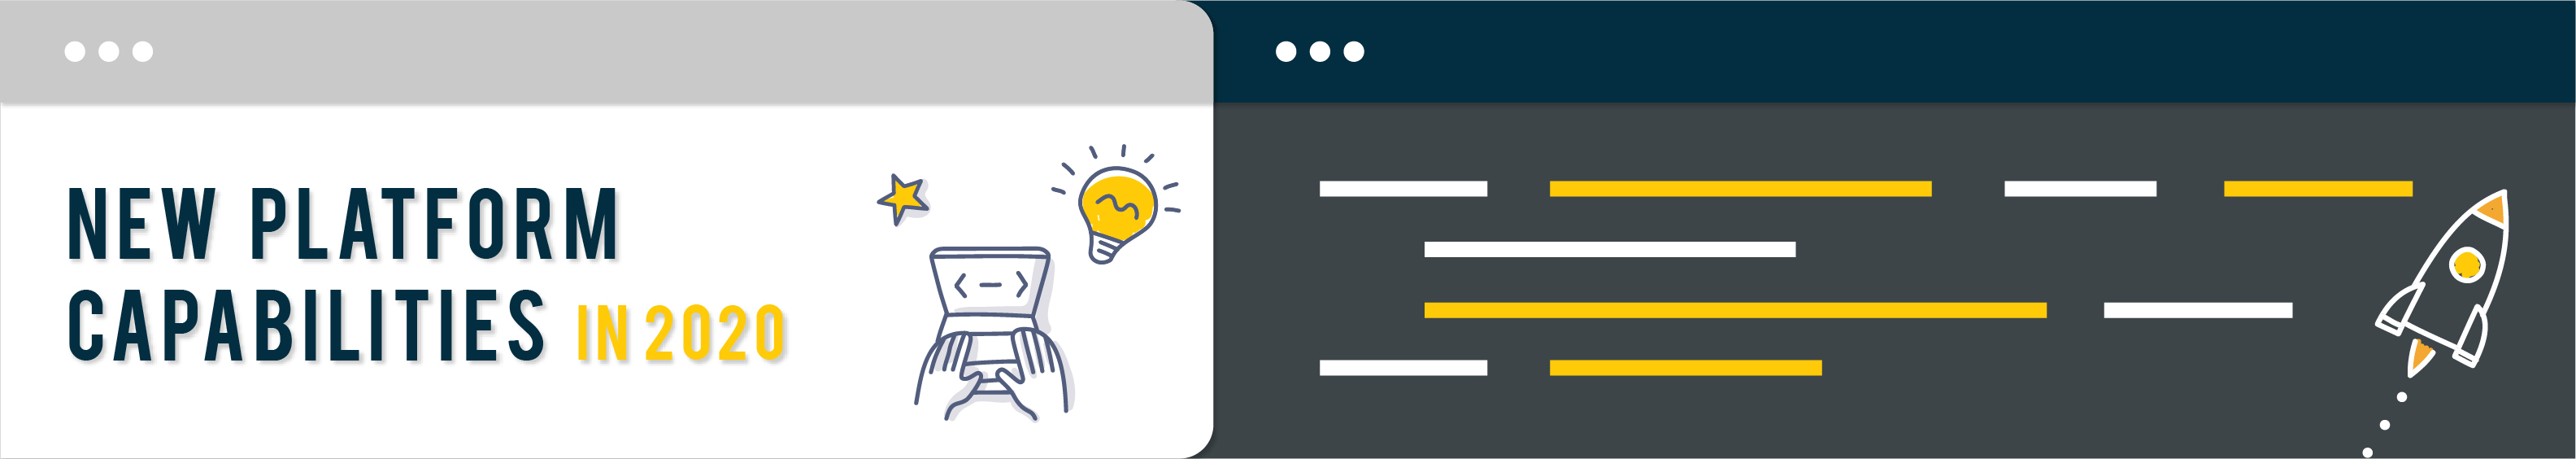 Innovations__New Platform Capabilities